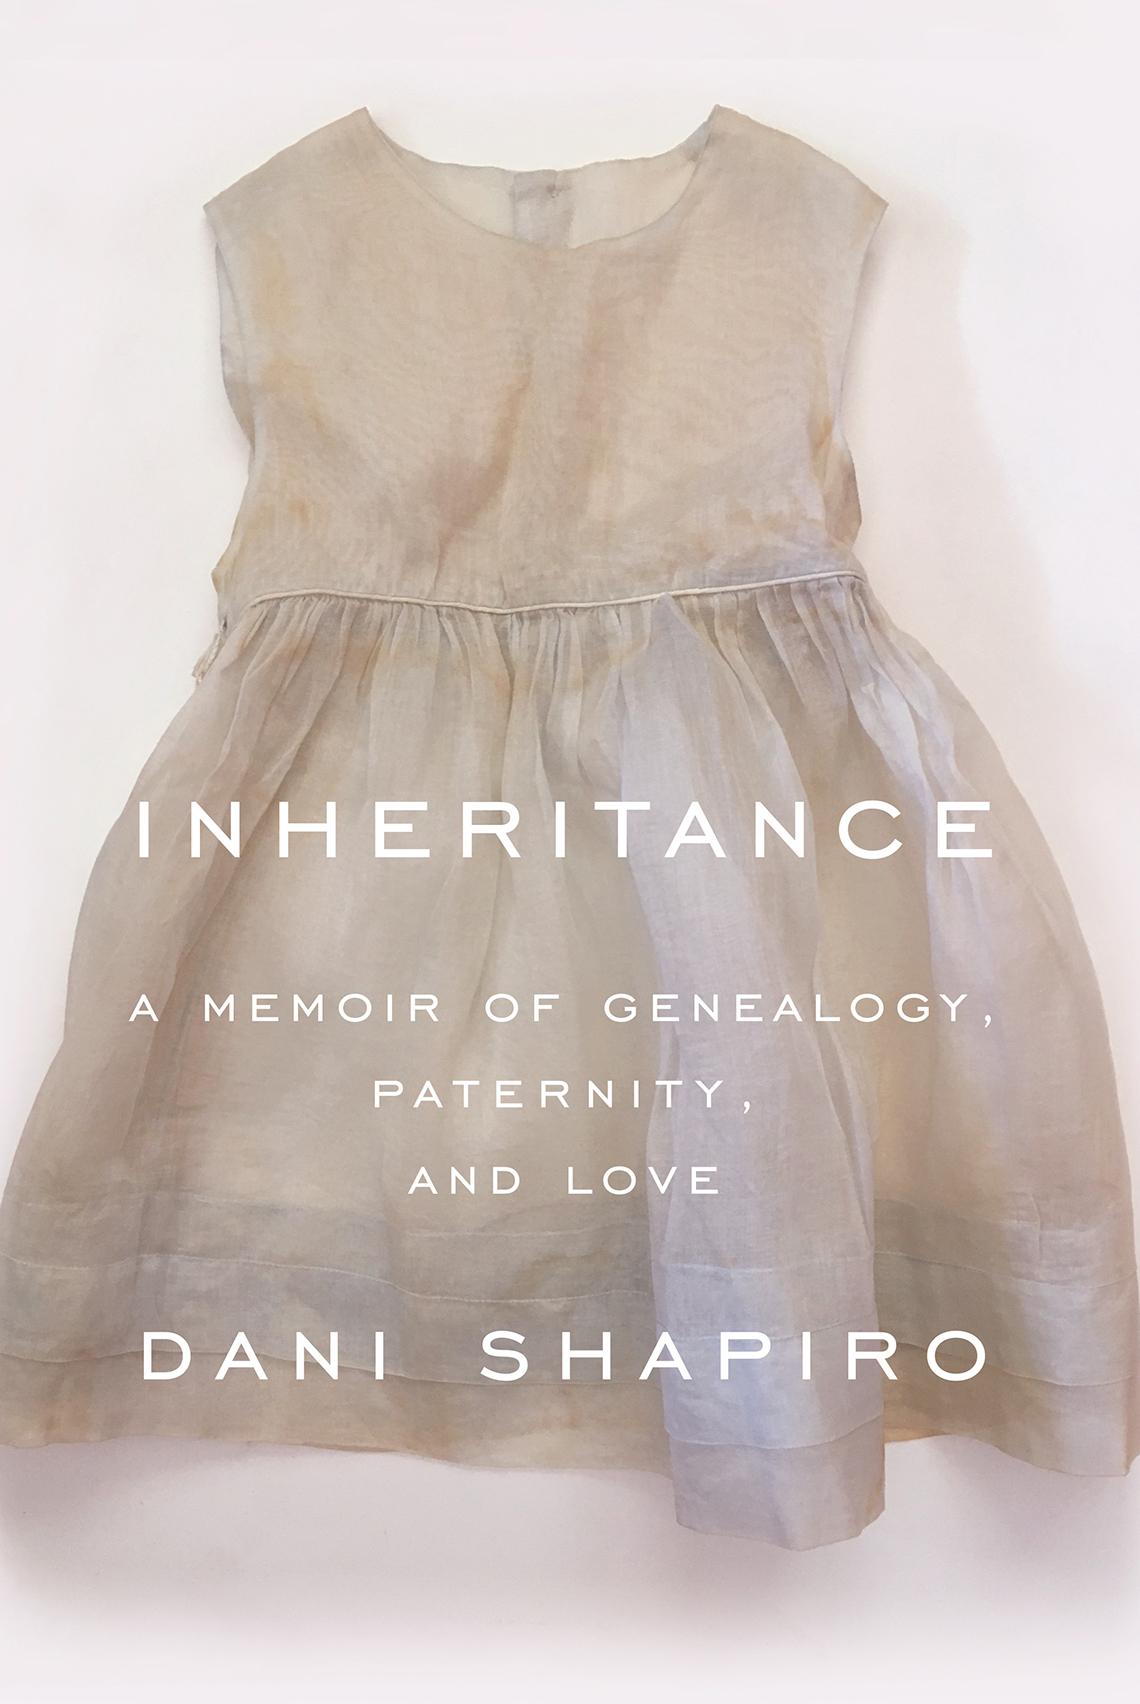 Book cover reads: Inheritance: A Memoir of Genealogy, Paternity and Love, Dani Shapiro